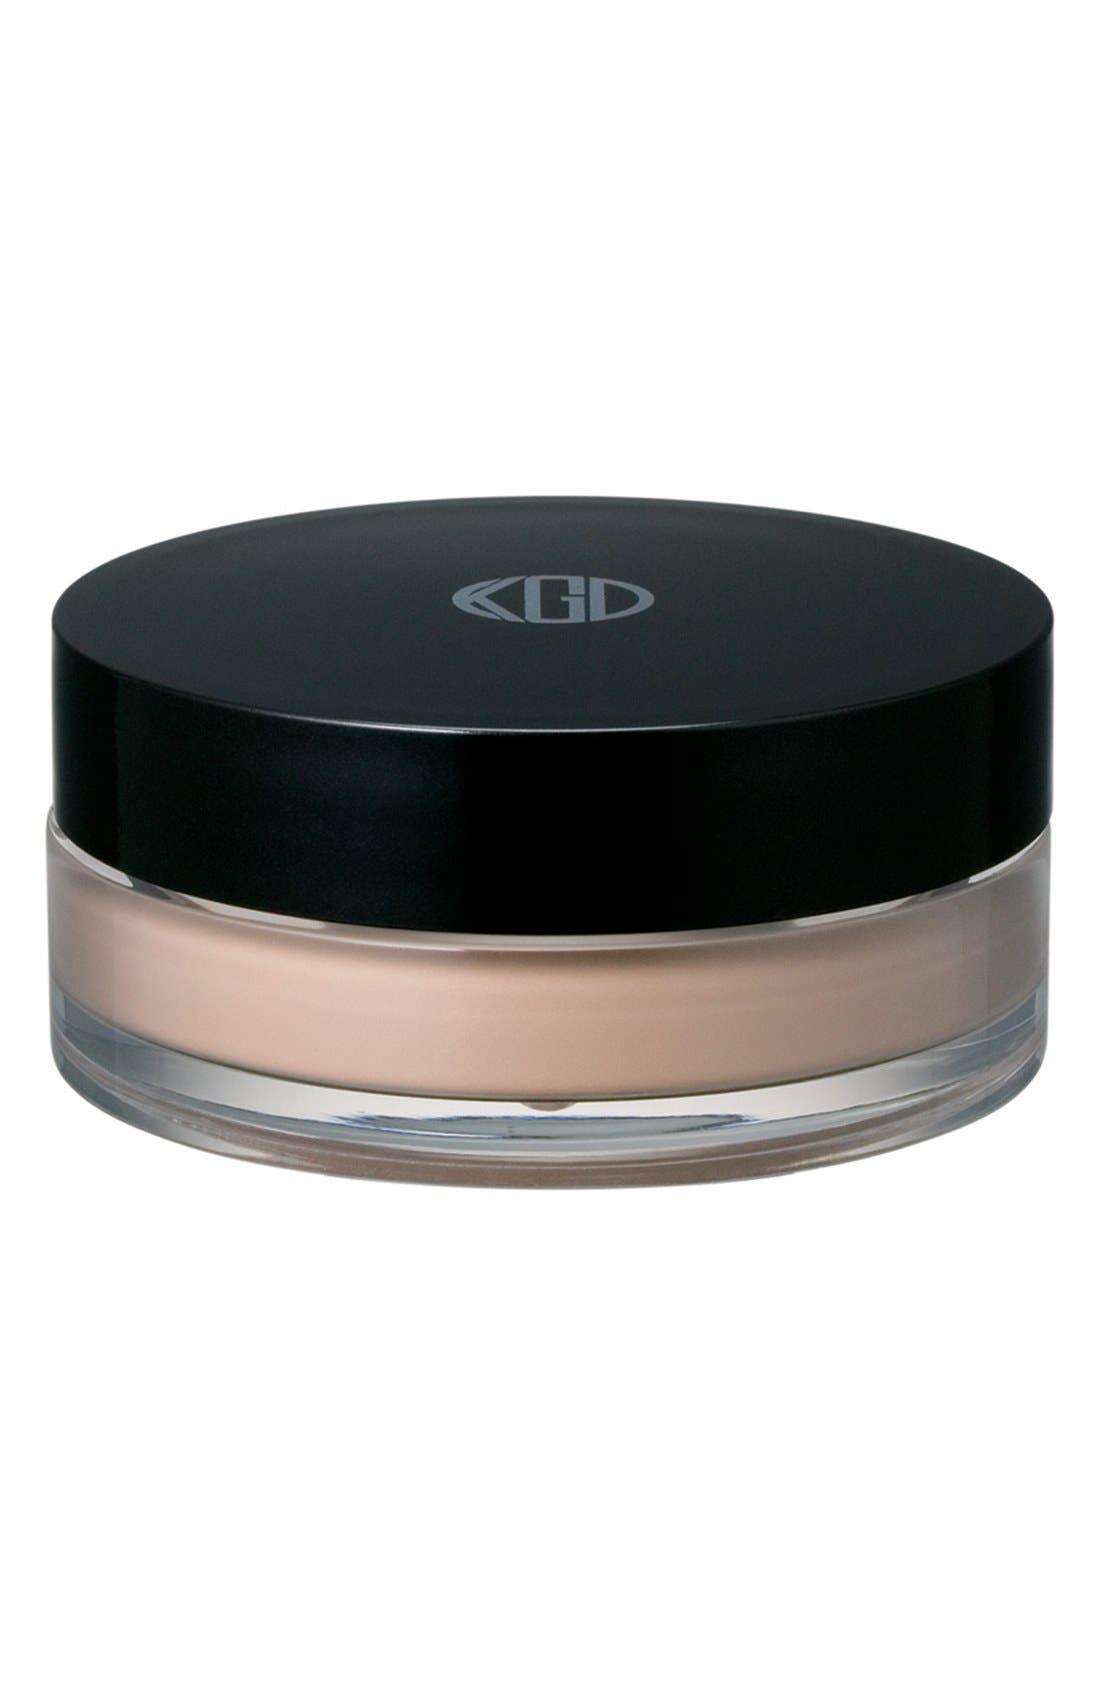 Koh Gen Do 'Maifanshi' Natural Lighting Powder